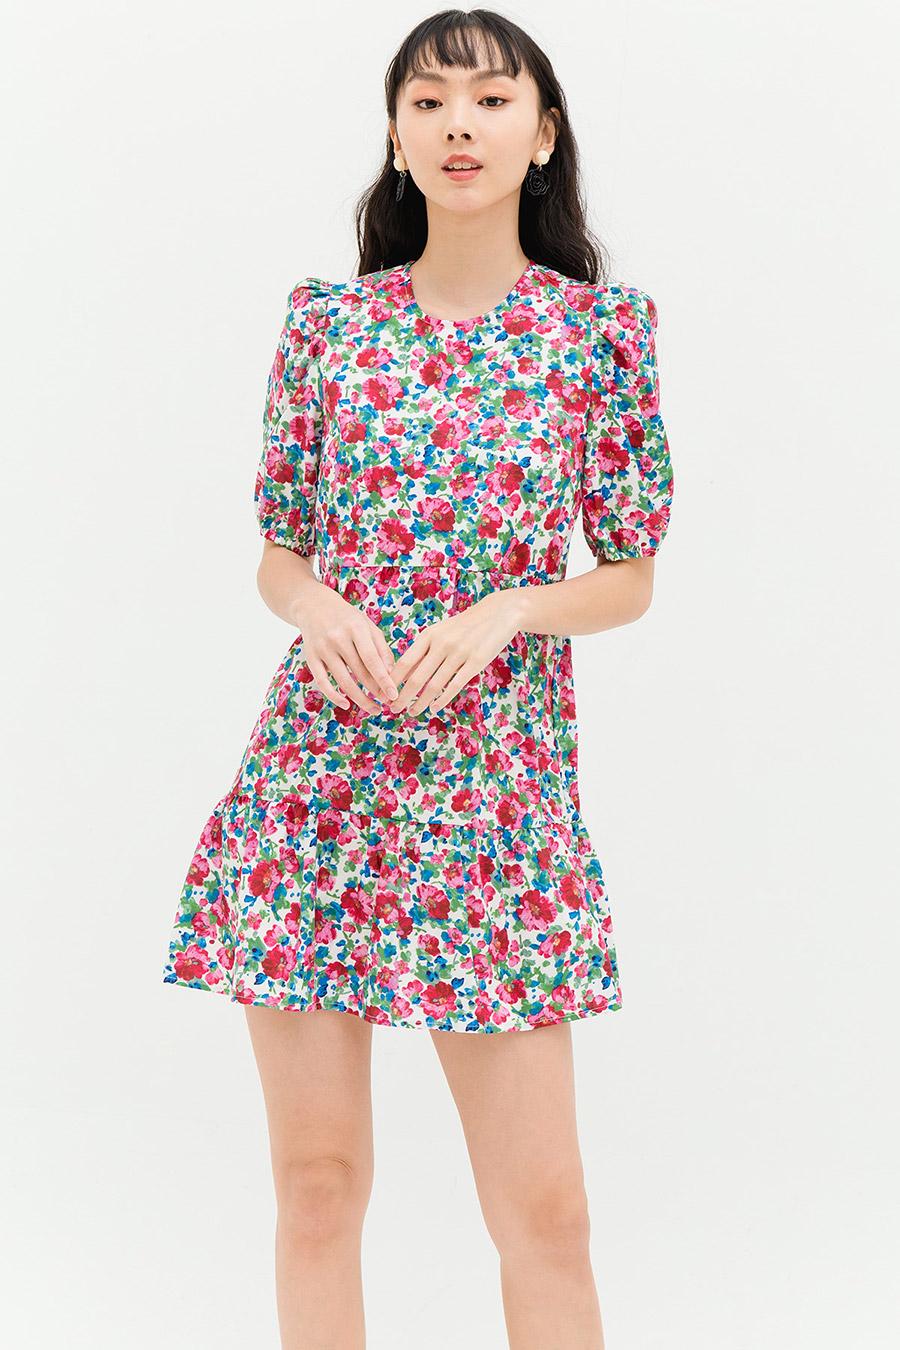 ANNABEL DRESS - IVORY FLEUR